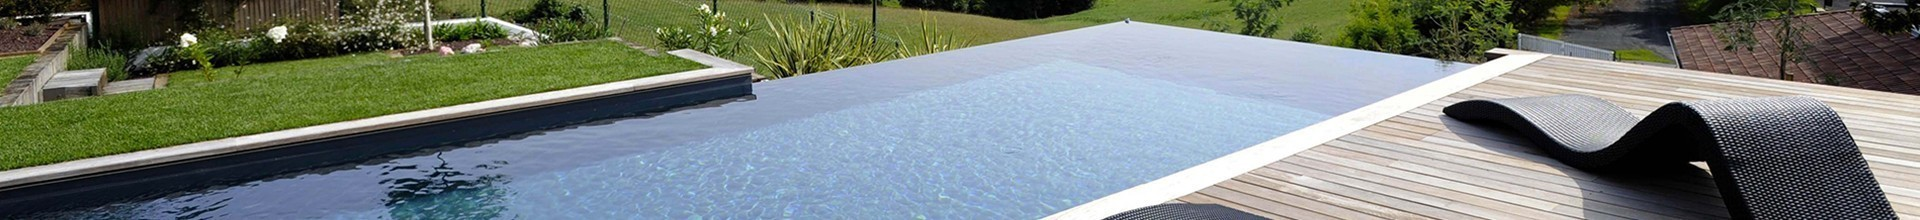 ✅ Rhône Alpes Kit piscine béton Allier. Fabricant piscine